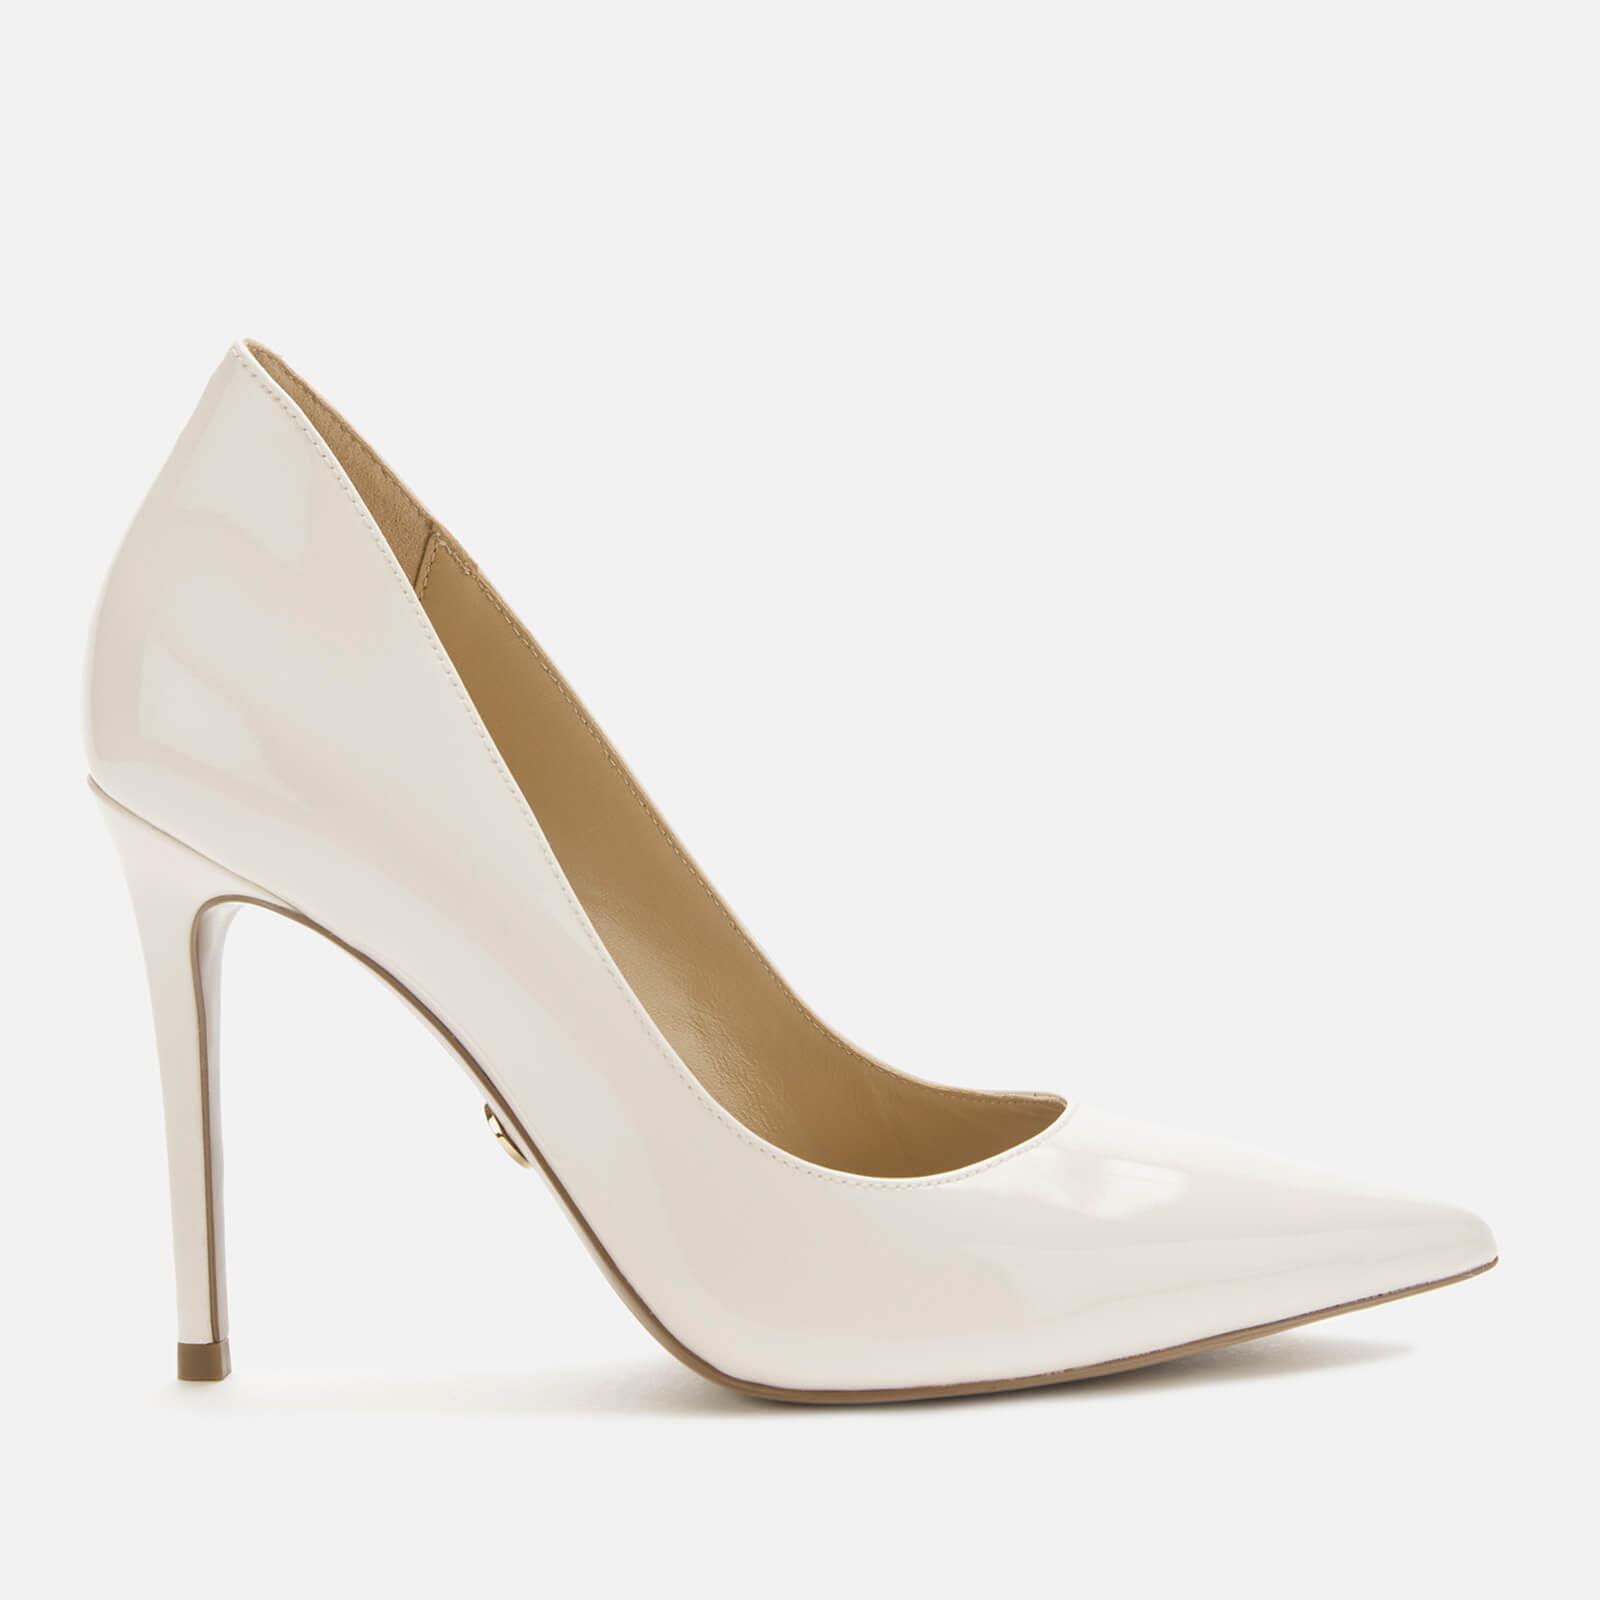 MICHAEL MICHAEL KORS Women's Keke Patent Leather Court Shoes - Light Cream - UK 3/US 6